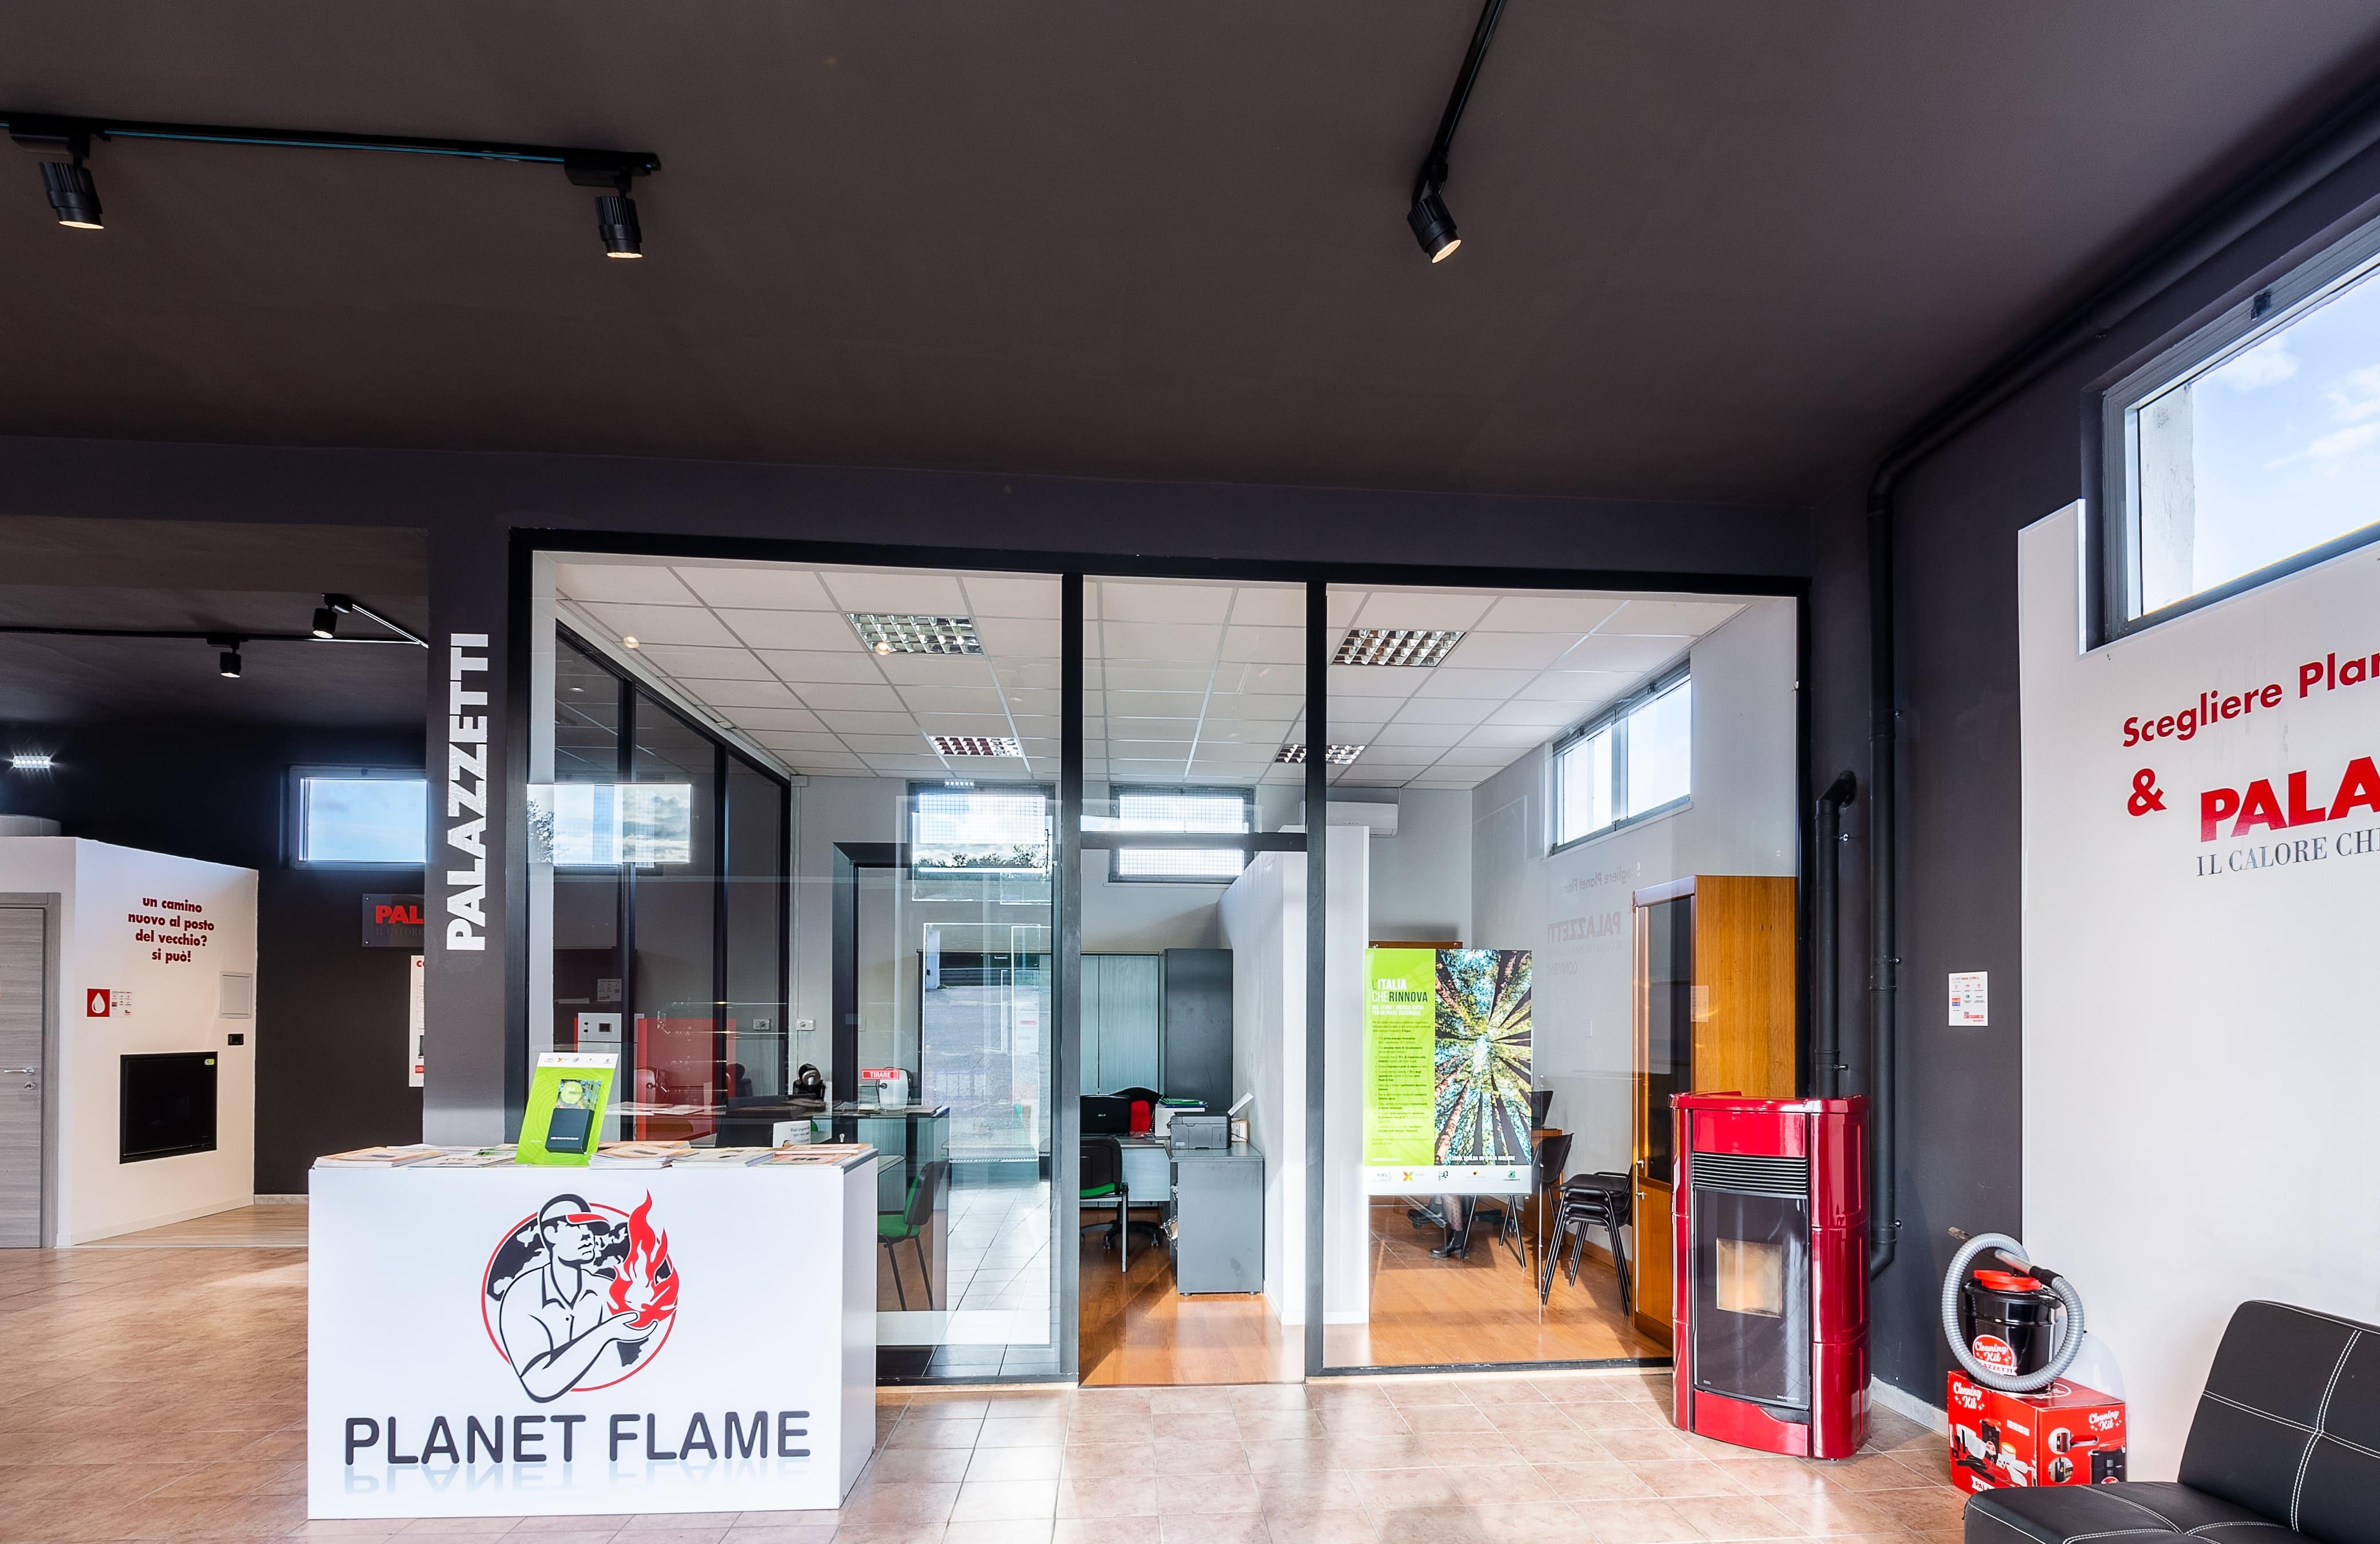 negozio_planet_flame_sassari_09